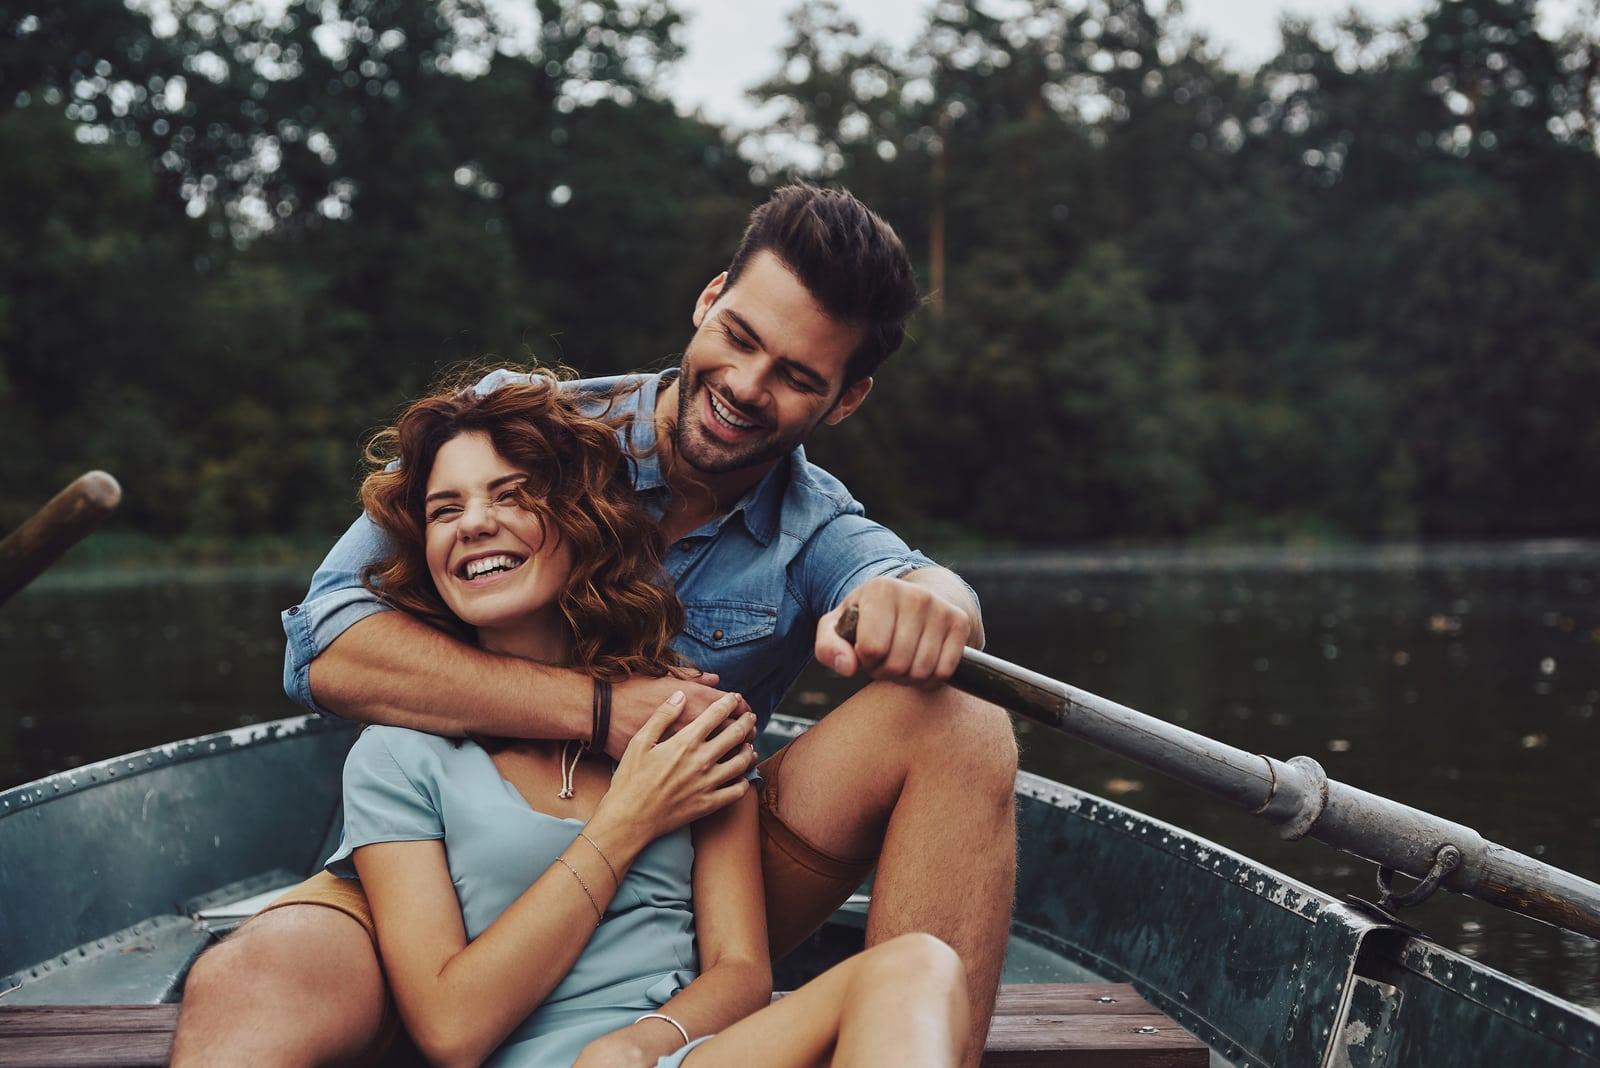 a smiling loving couple hugging and kayaking